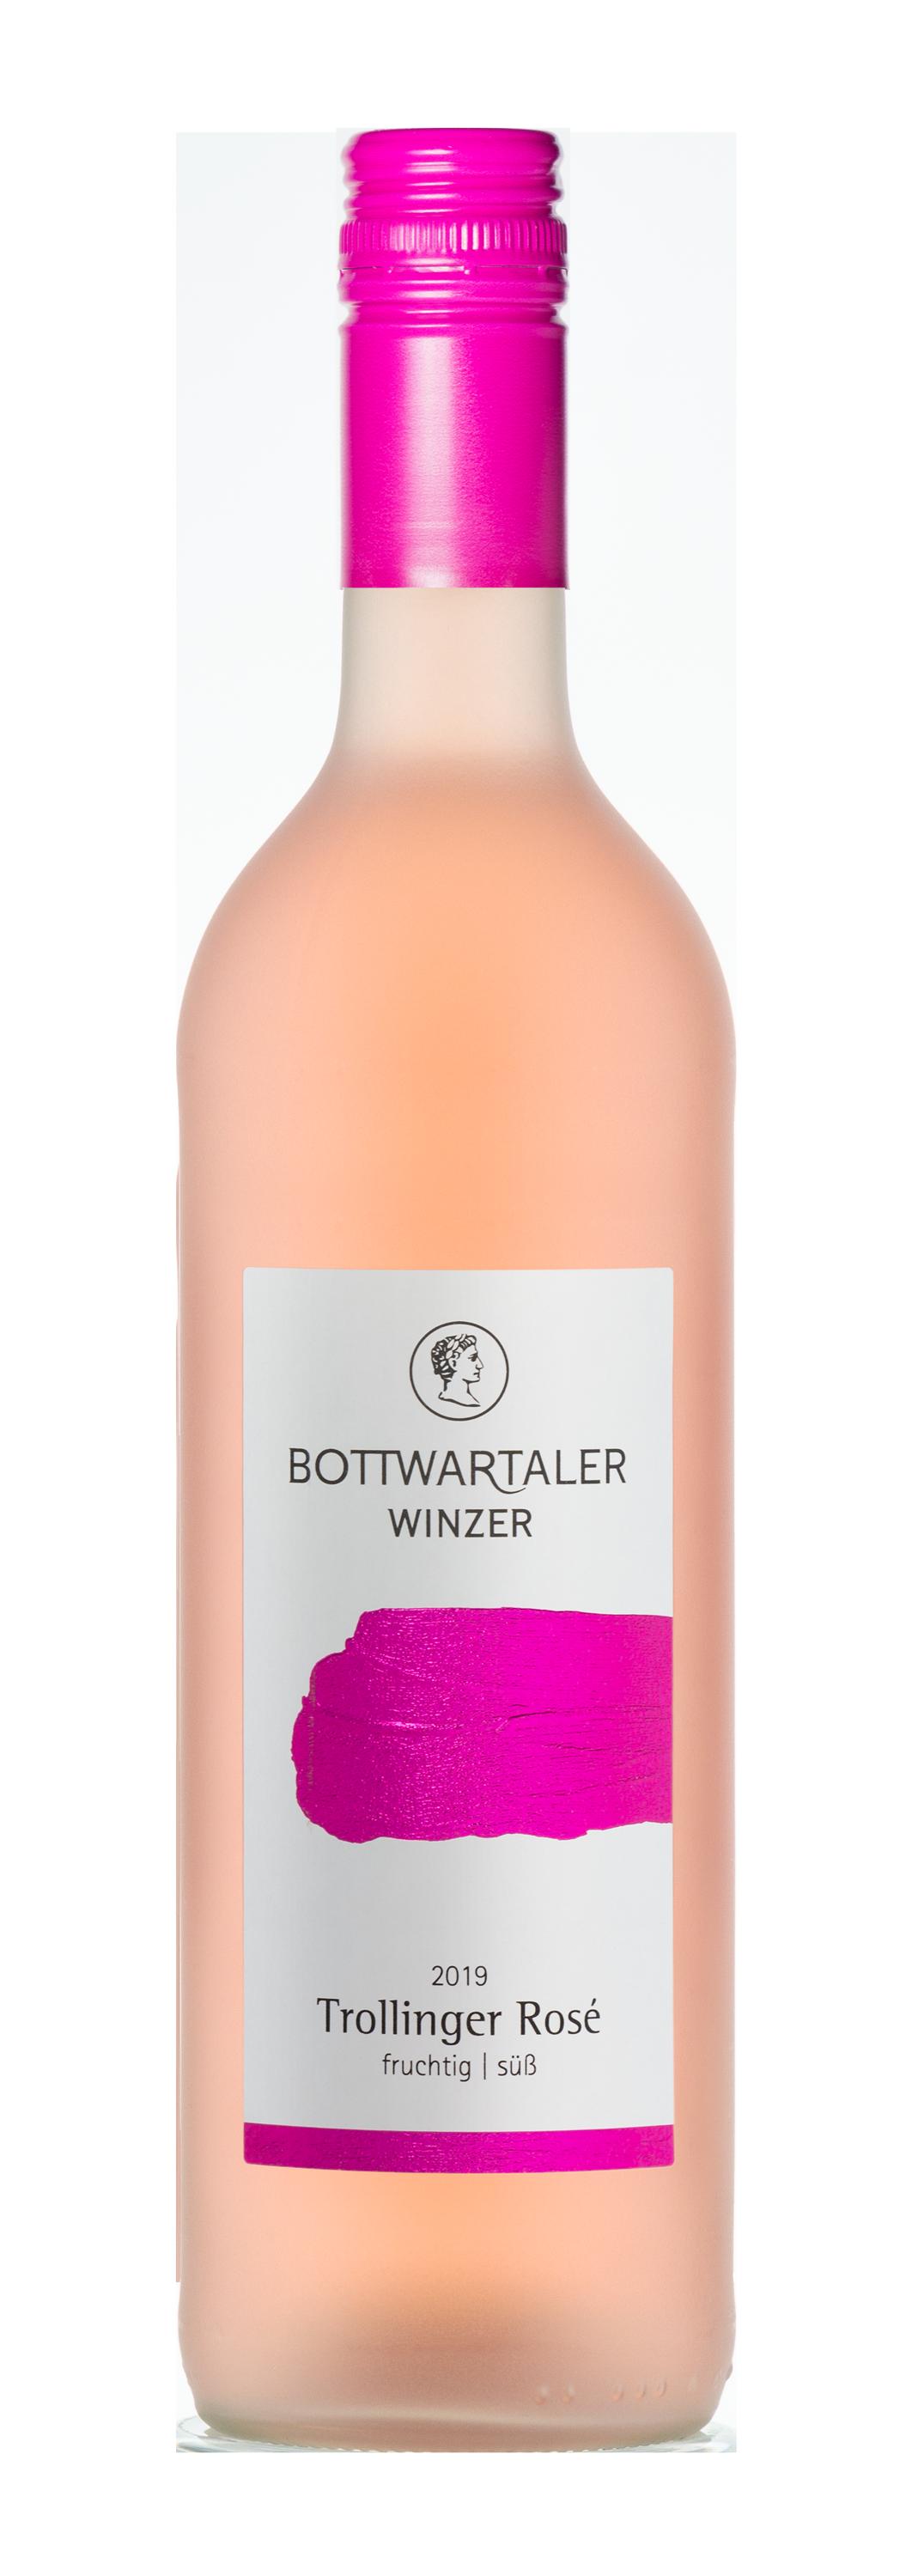 Trollinger Rosé fruchtig | süß der Bottwartaler Winzer